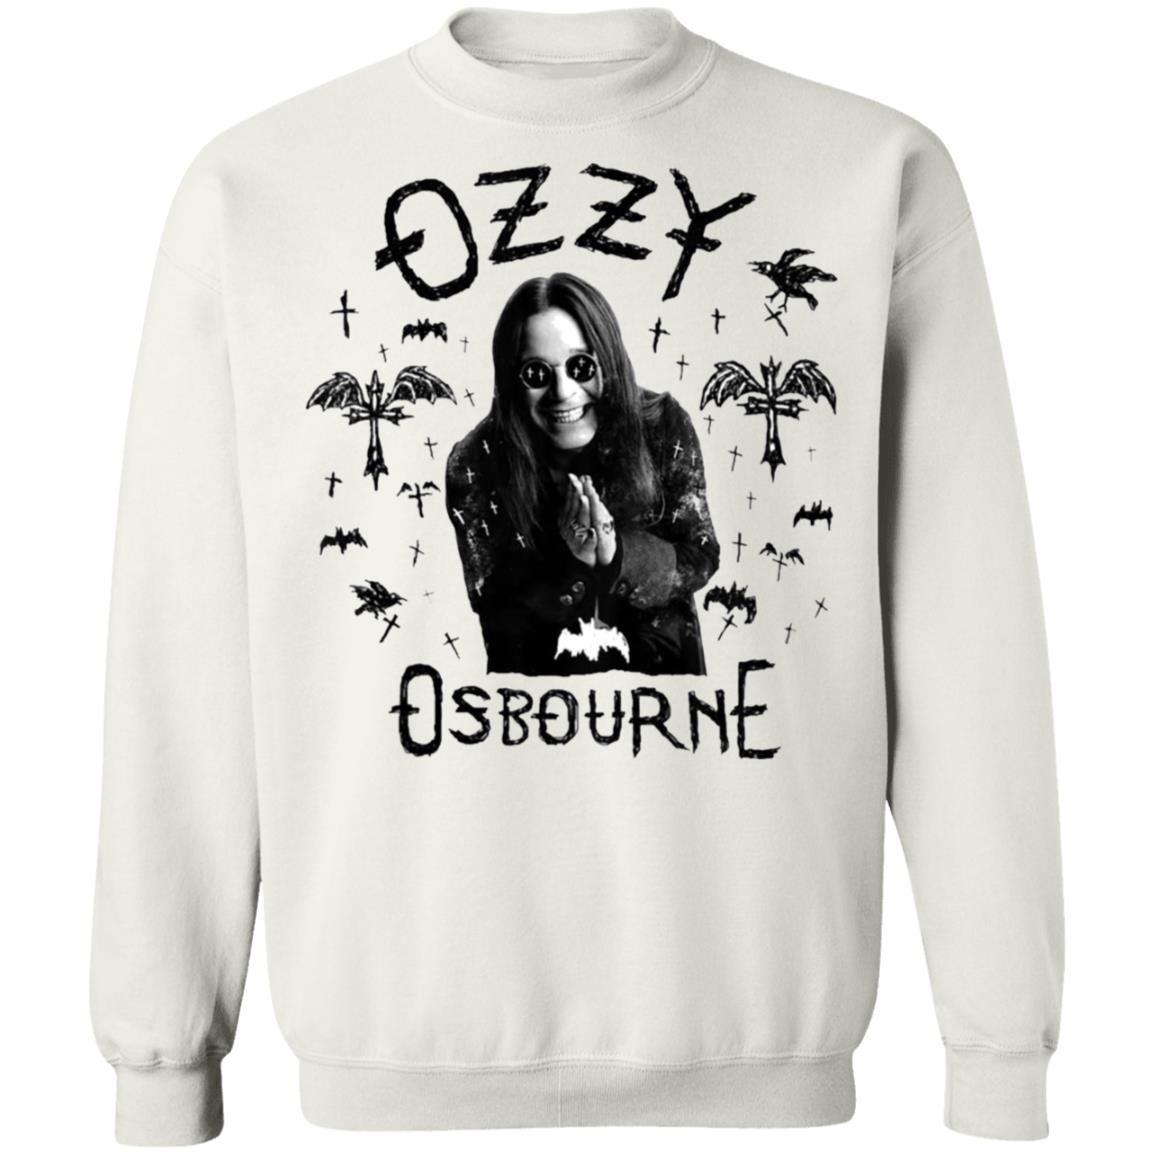 Ozzy Osbourne Flying Cross Shirt